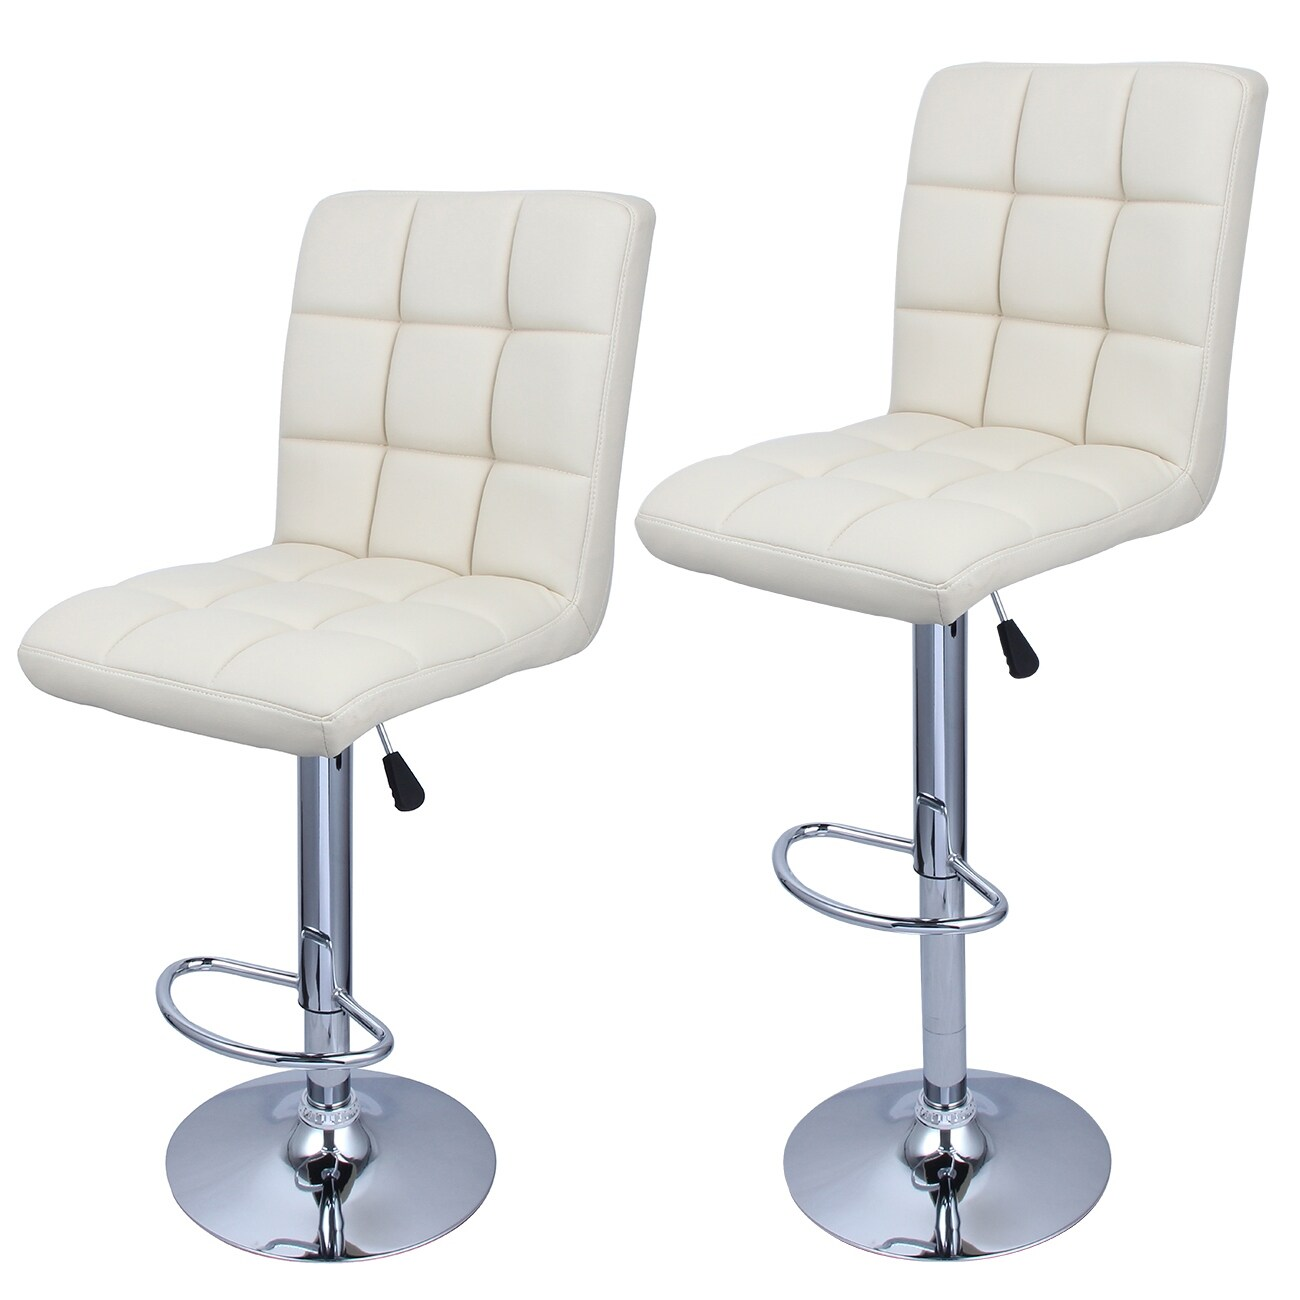 Phenomenal Belleze Swivel Leather Adjustable Hydraulic Bar Stool Cream Soda Set Of 2 Machost Co Dining Chair Design Ideas Machostcouk